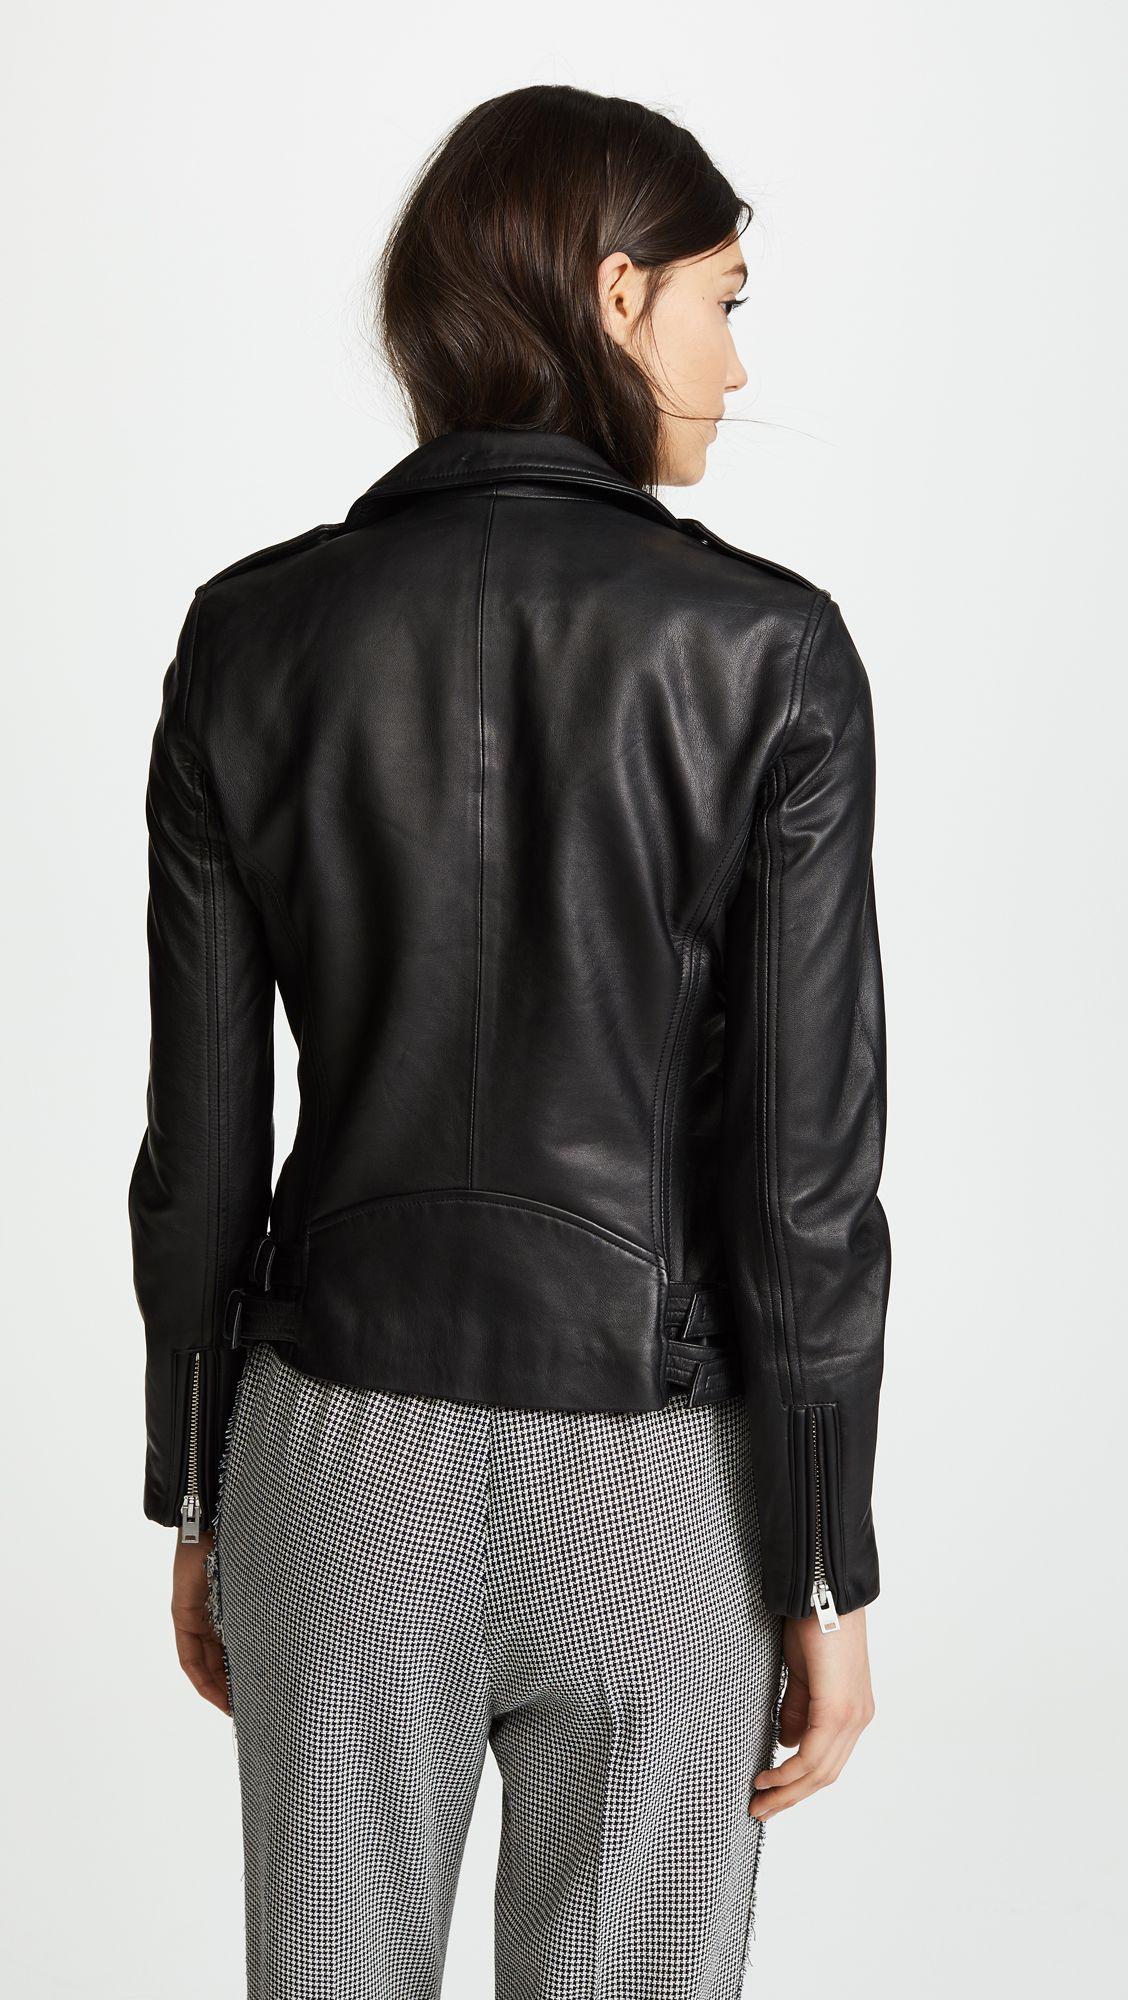 Iro Han Leather Jacket Shopbop Leather Jacket Jackets Leather Jackets Women [ 2000 x 1128 Pixel ]